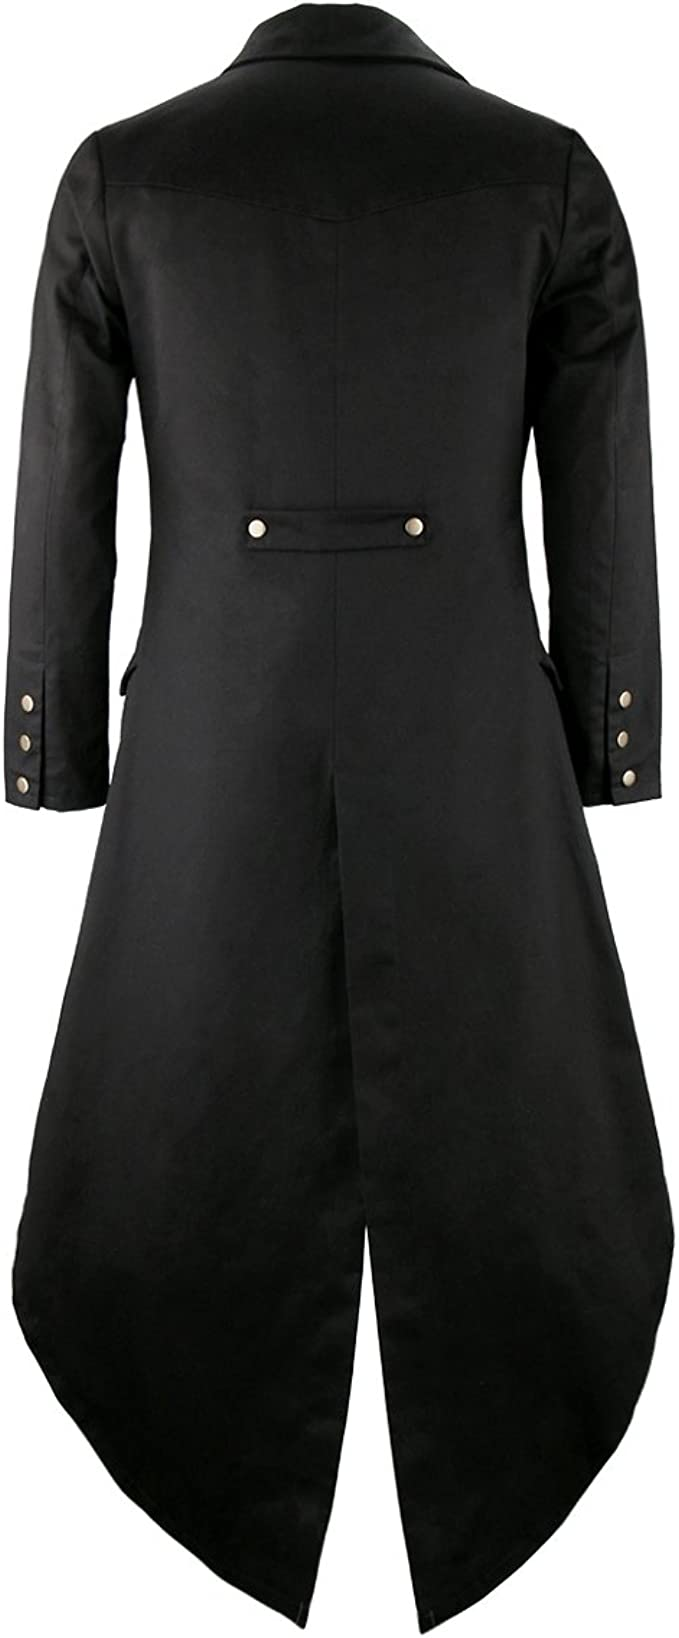 Men TUXEDO Jacket Tail coat Goth Steampunk Victorian Nightclubs Wedding Party